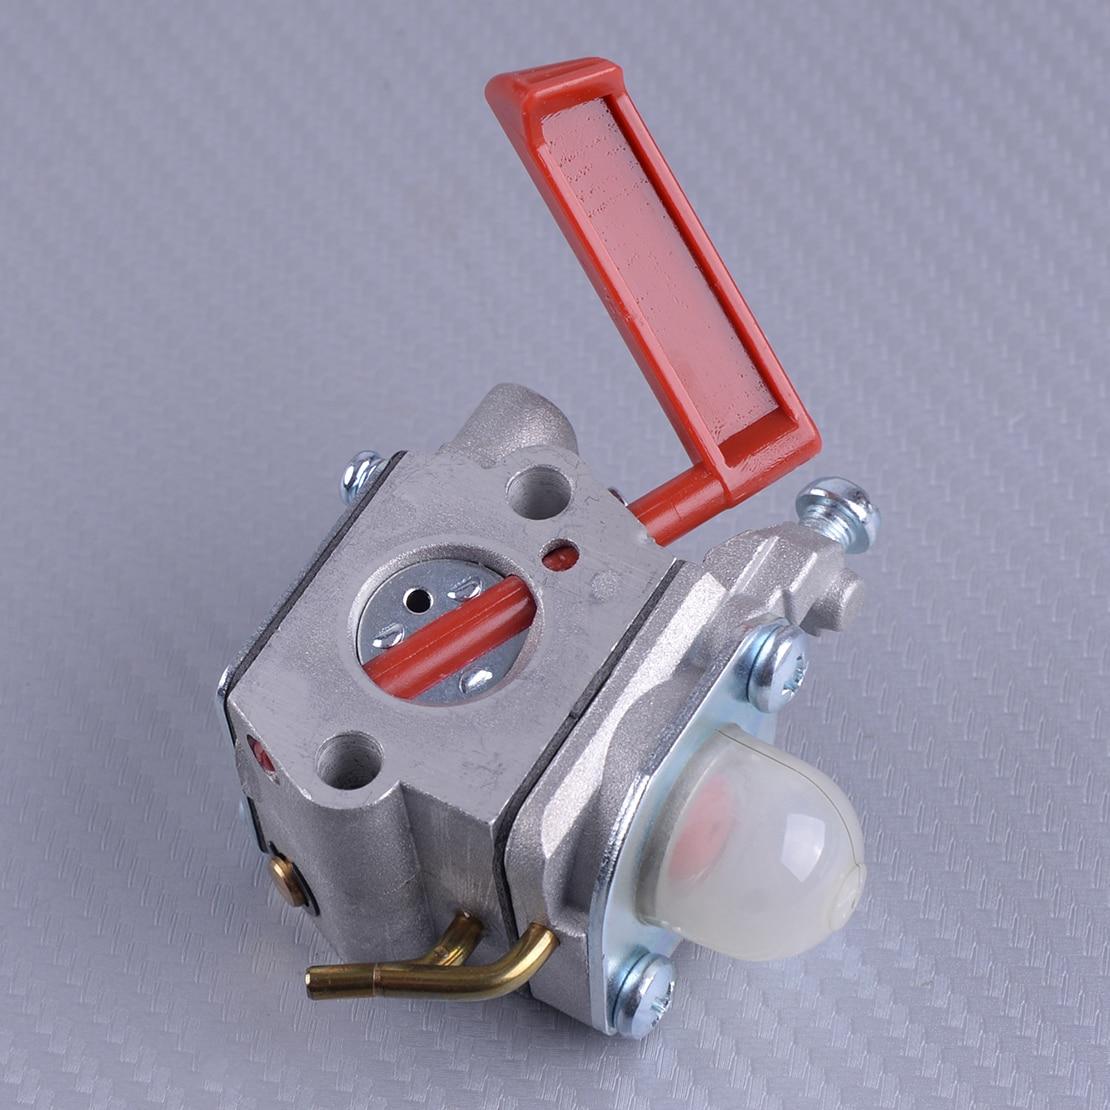 LETAOSK 984534001 Carburetor Carb Fit For Homelite F2020 UT-20788 F2020 UT-20789 F3040 UT-15176